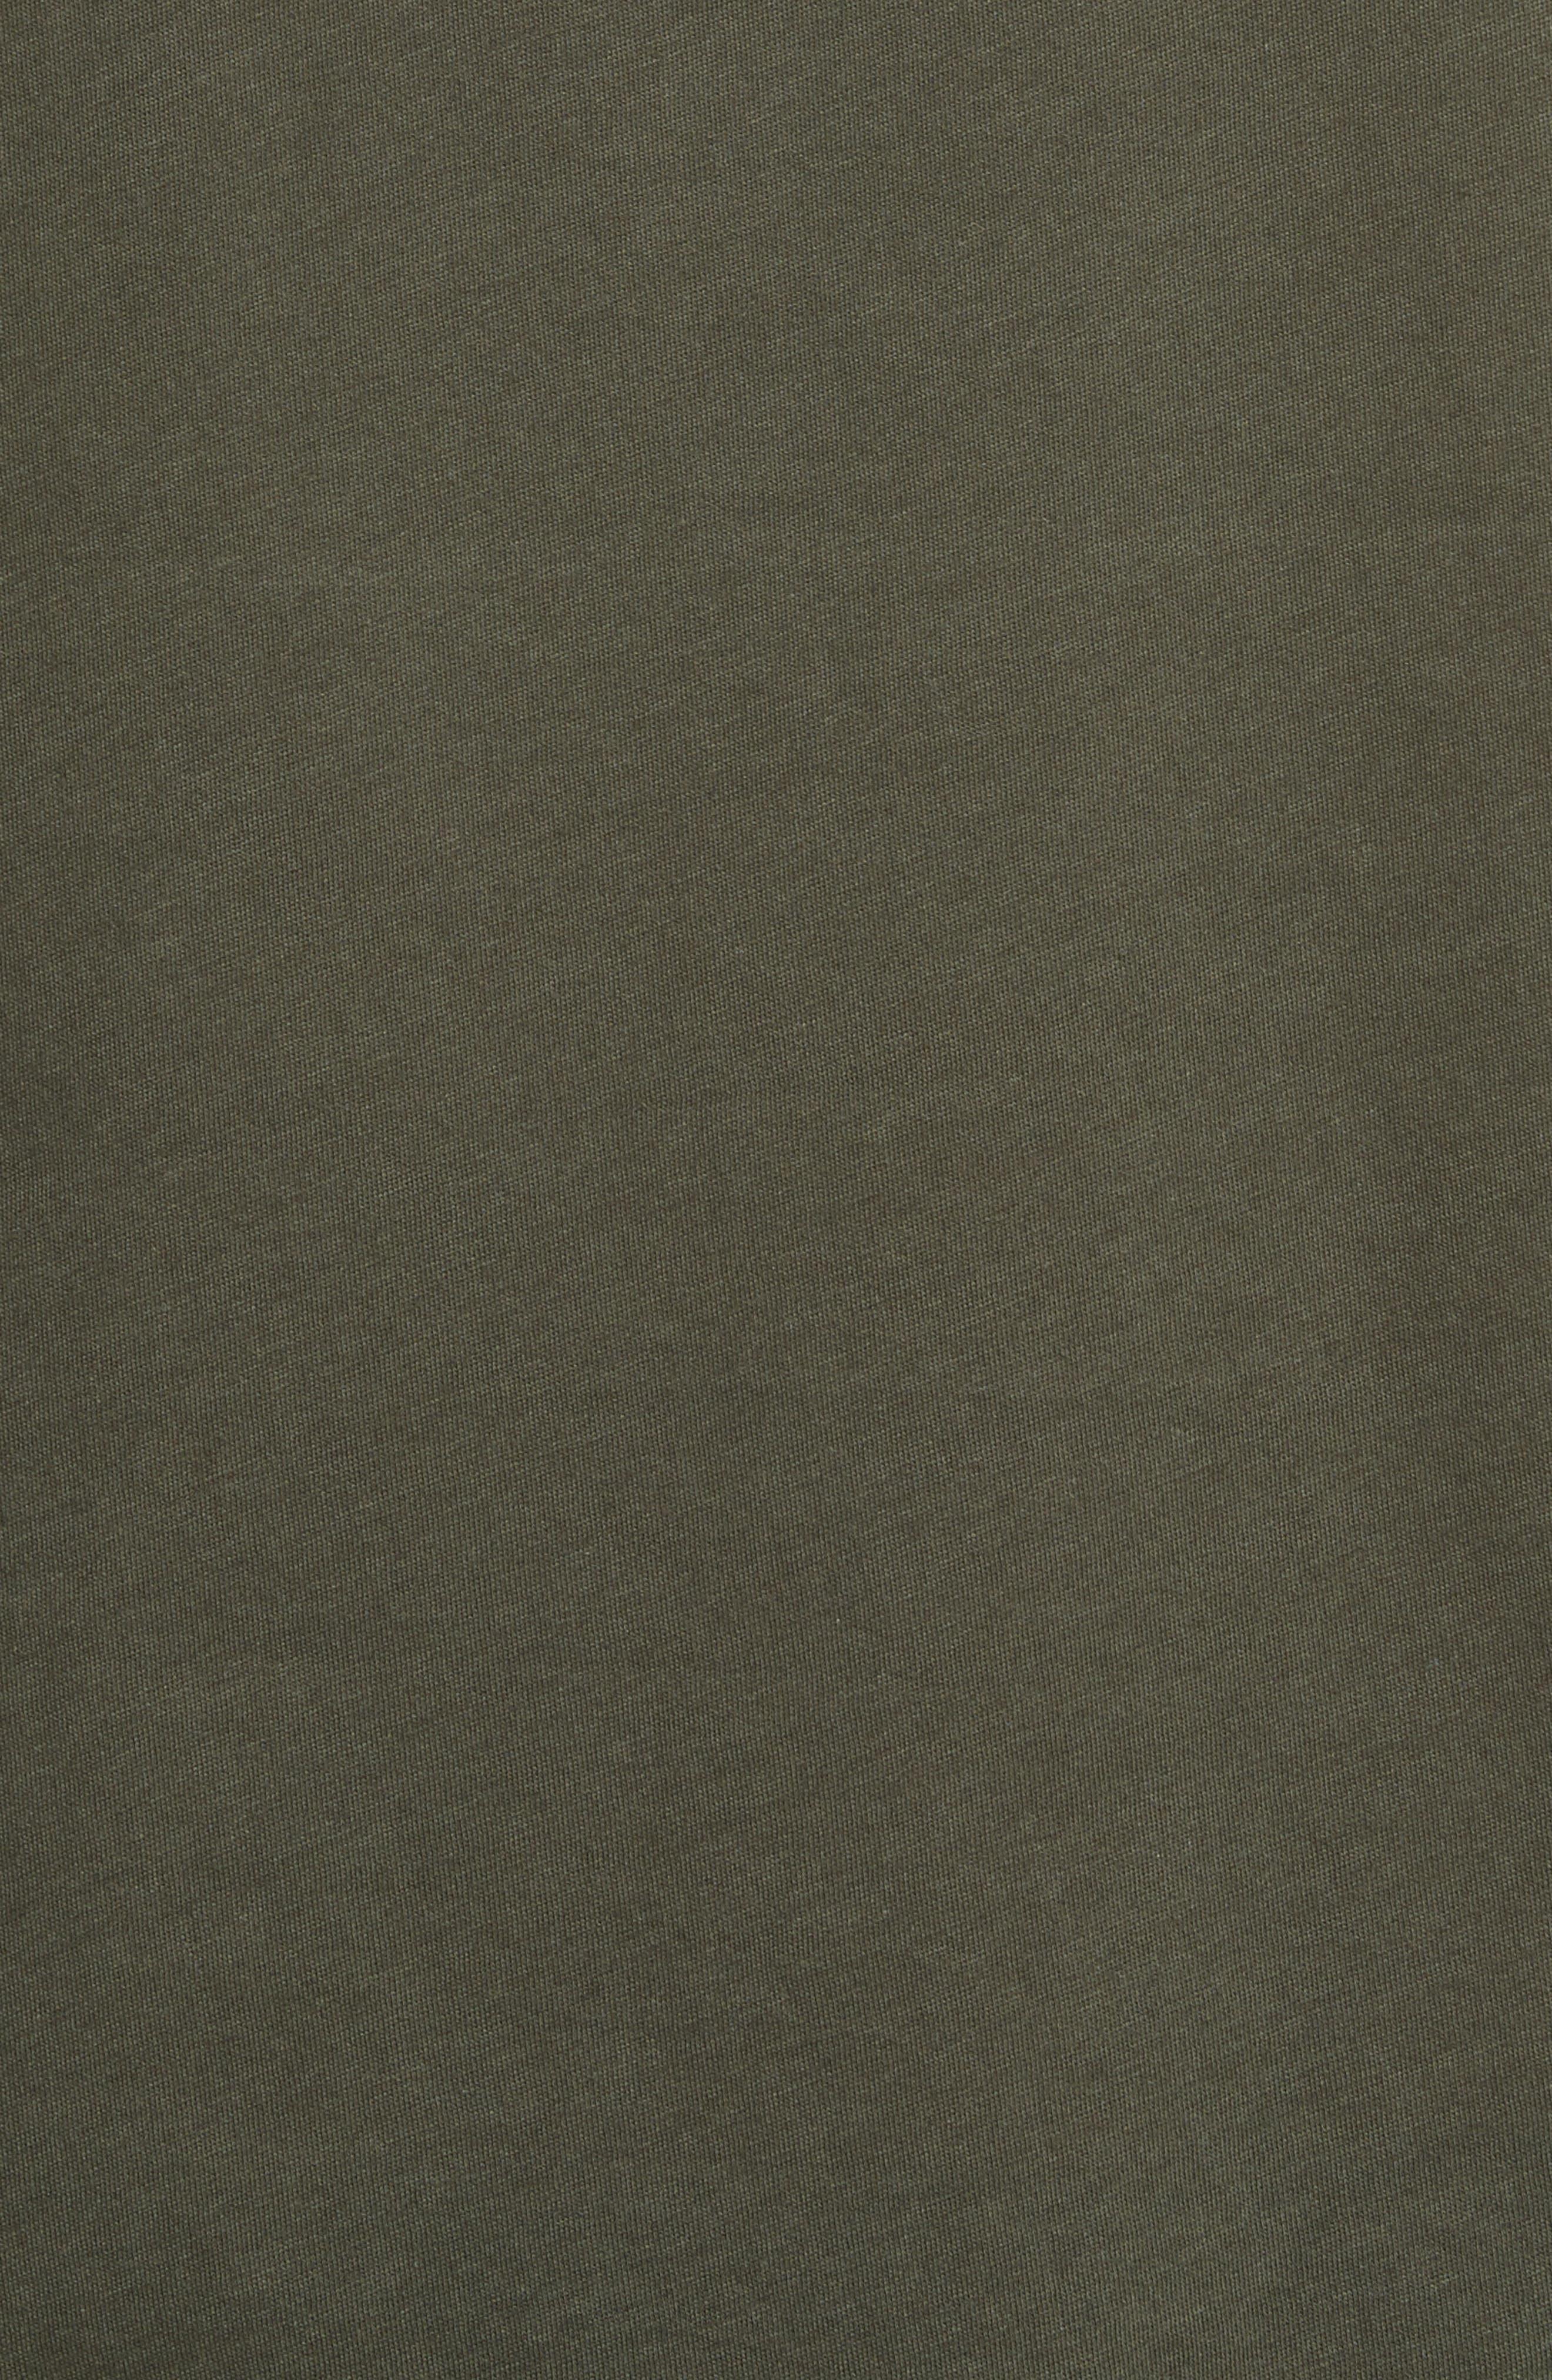 Alternate Image 5  - The Kooples Leather Pocket T-Shirt